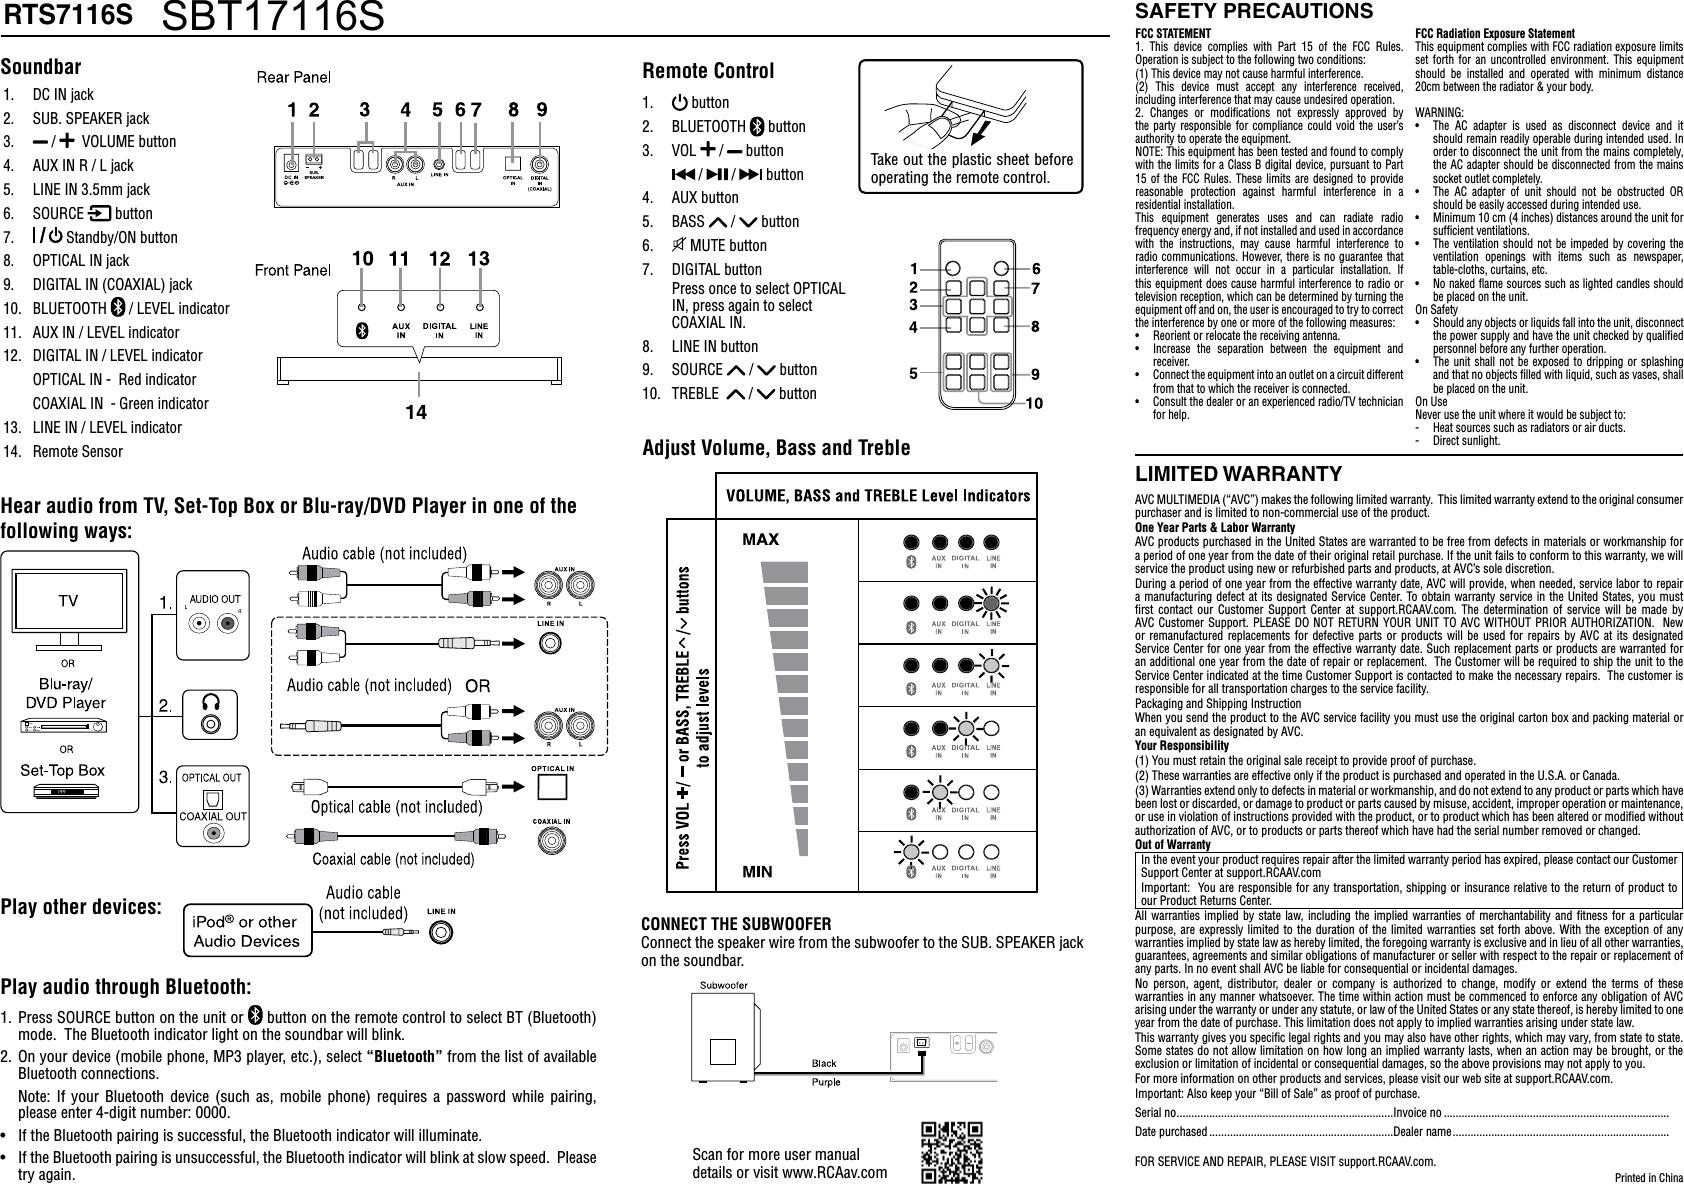 Alco Electronics RTS7116S Soundbar User Manual